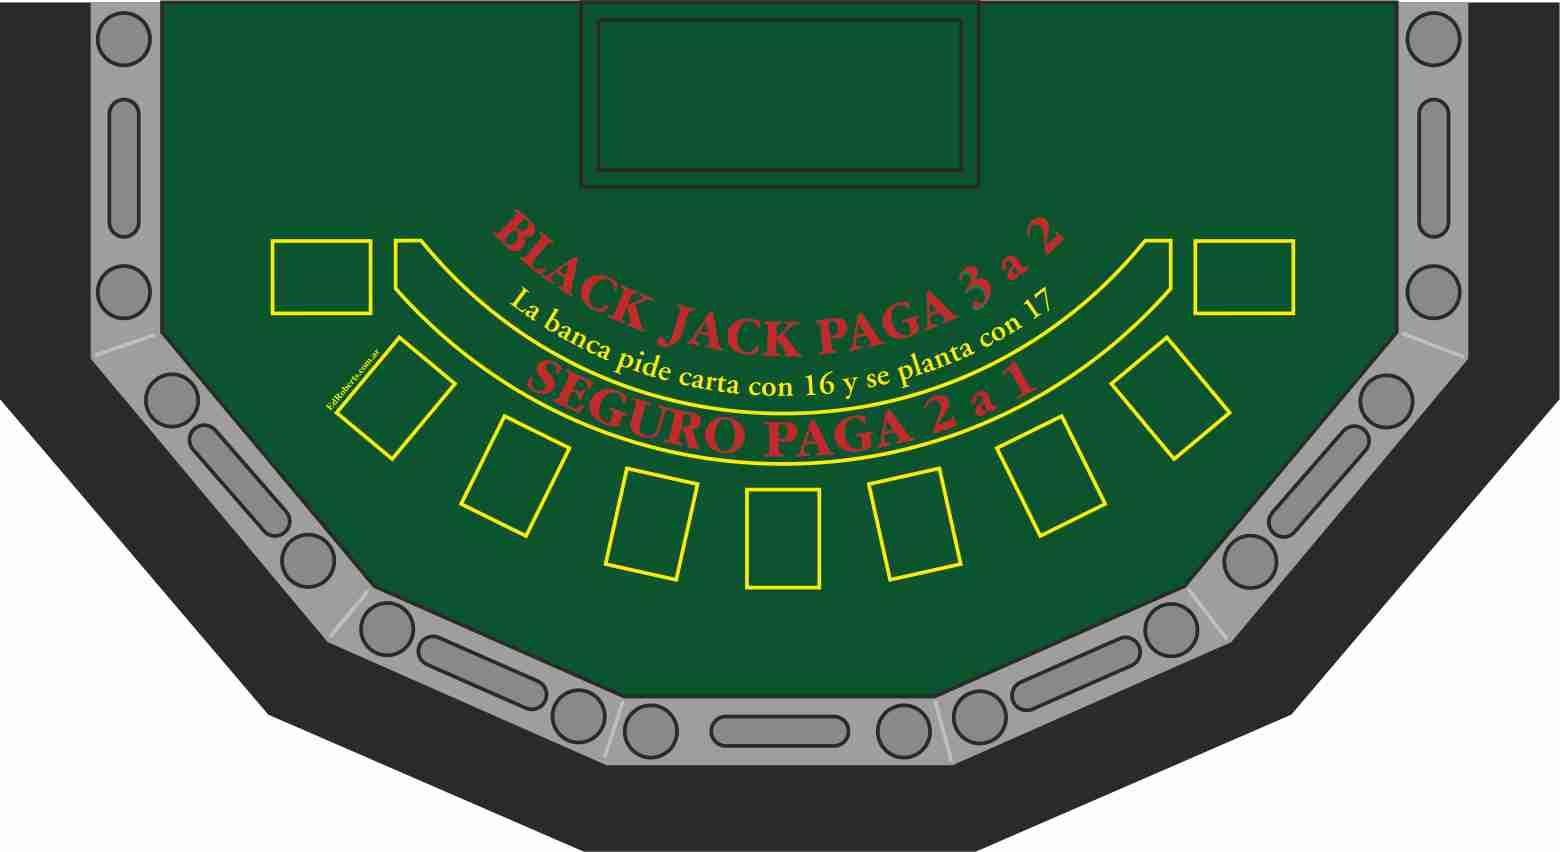 Black Jack 9 jugadores